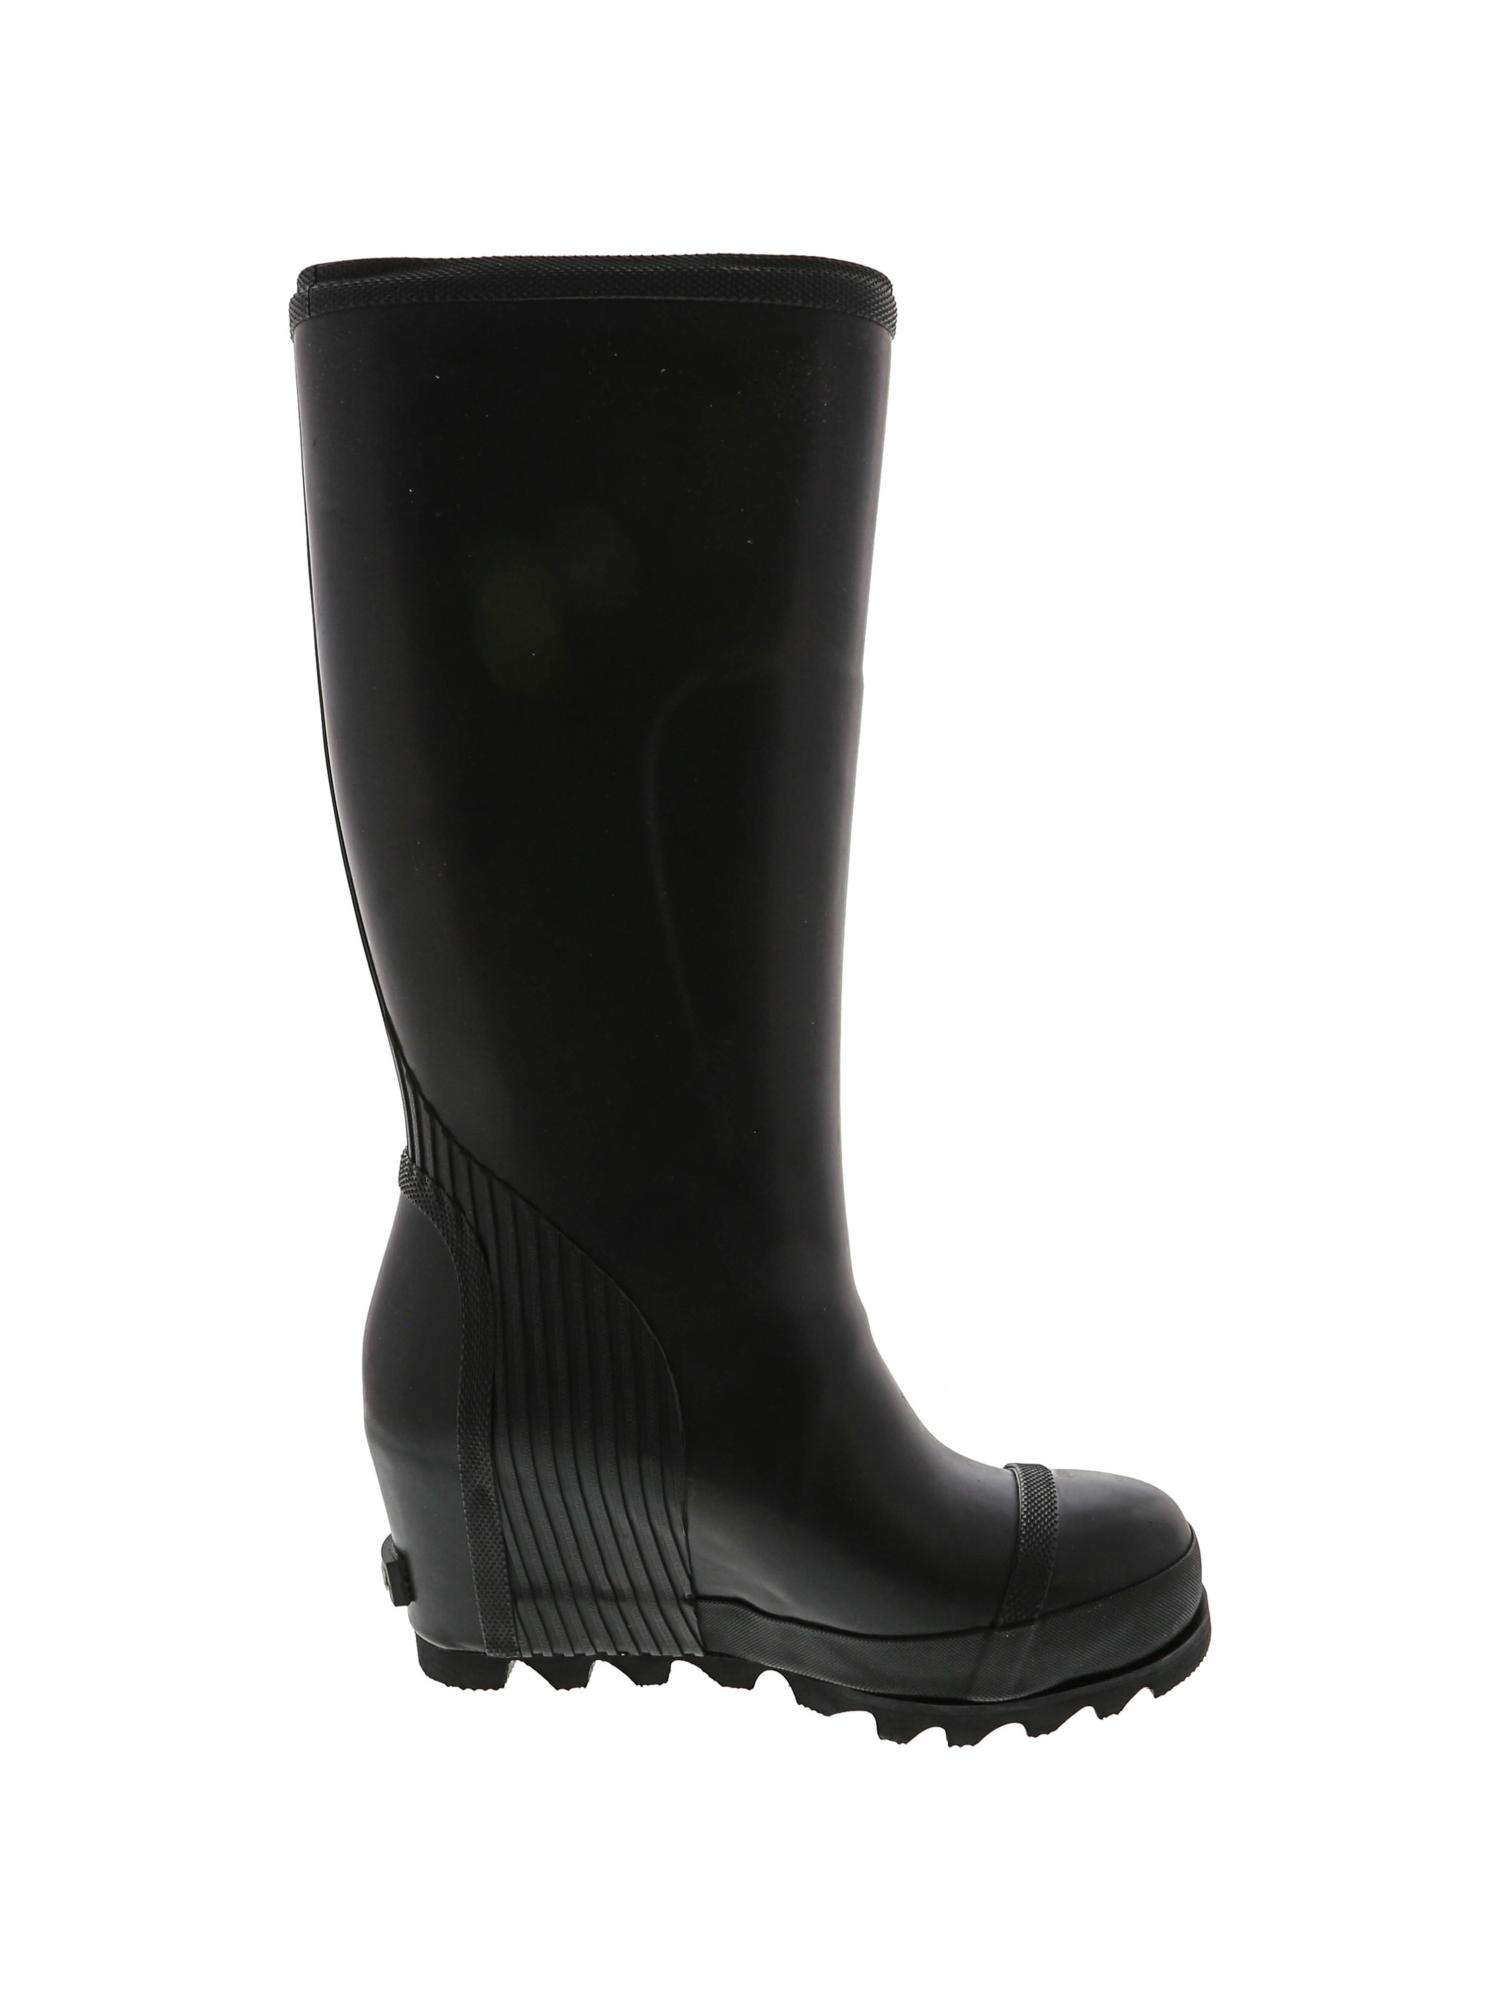 a131839b53c Sorel Women s Joan Rain Wedge Tall Knee-High Boot